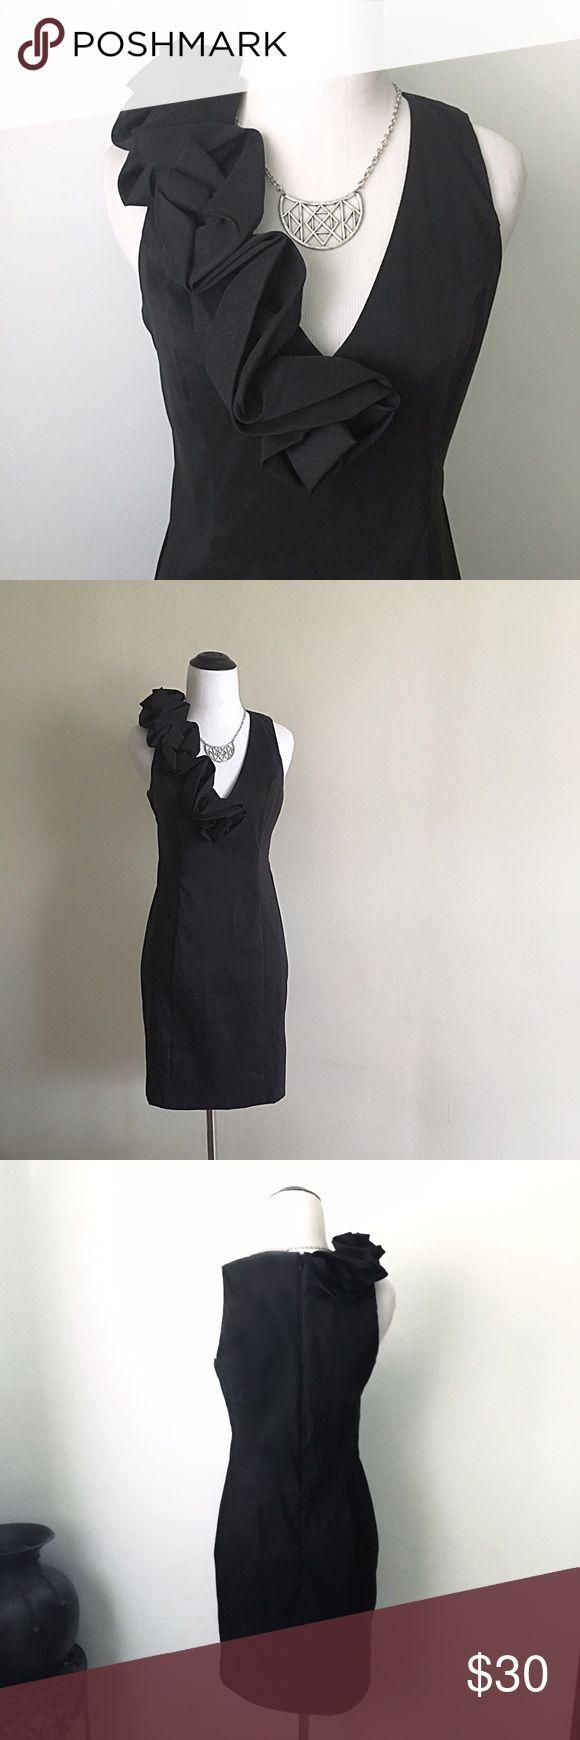 S.L Fashions black ruffle dress Gorgeous S.L Fashions black ruffle dress. Perfect condition, great quality! S.L Fashions Dresses